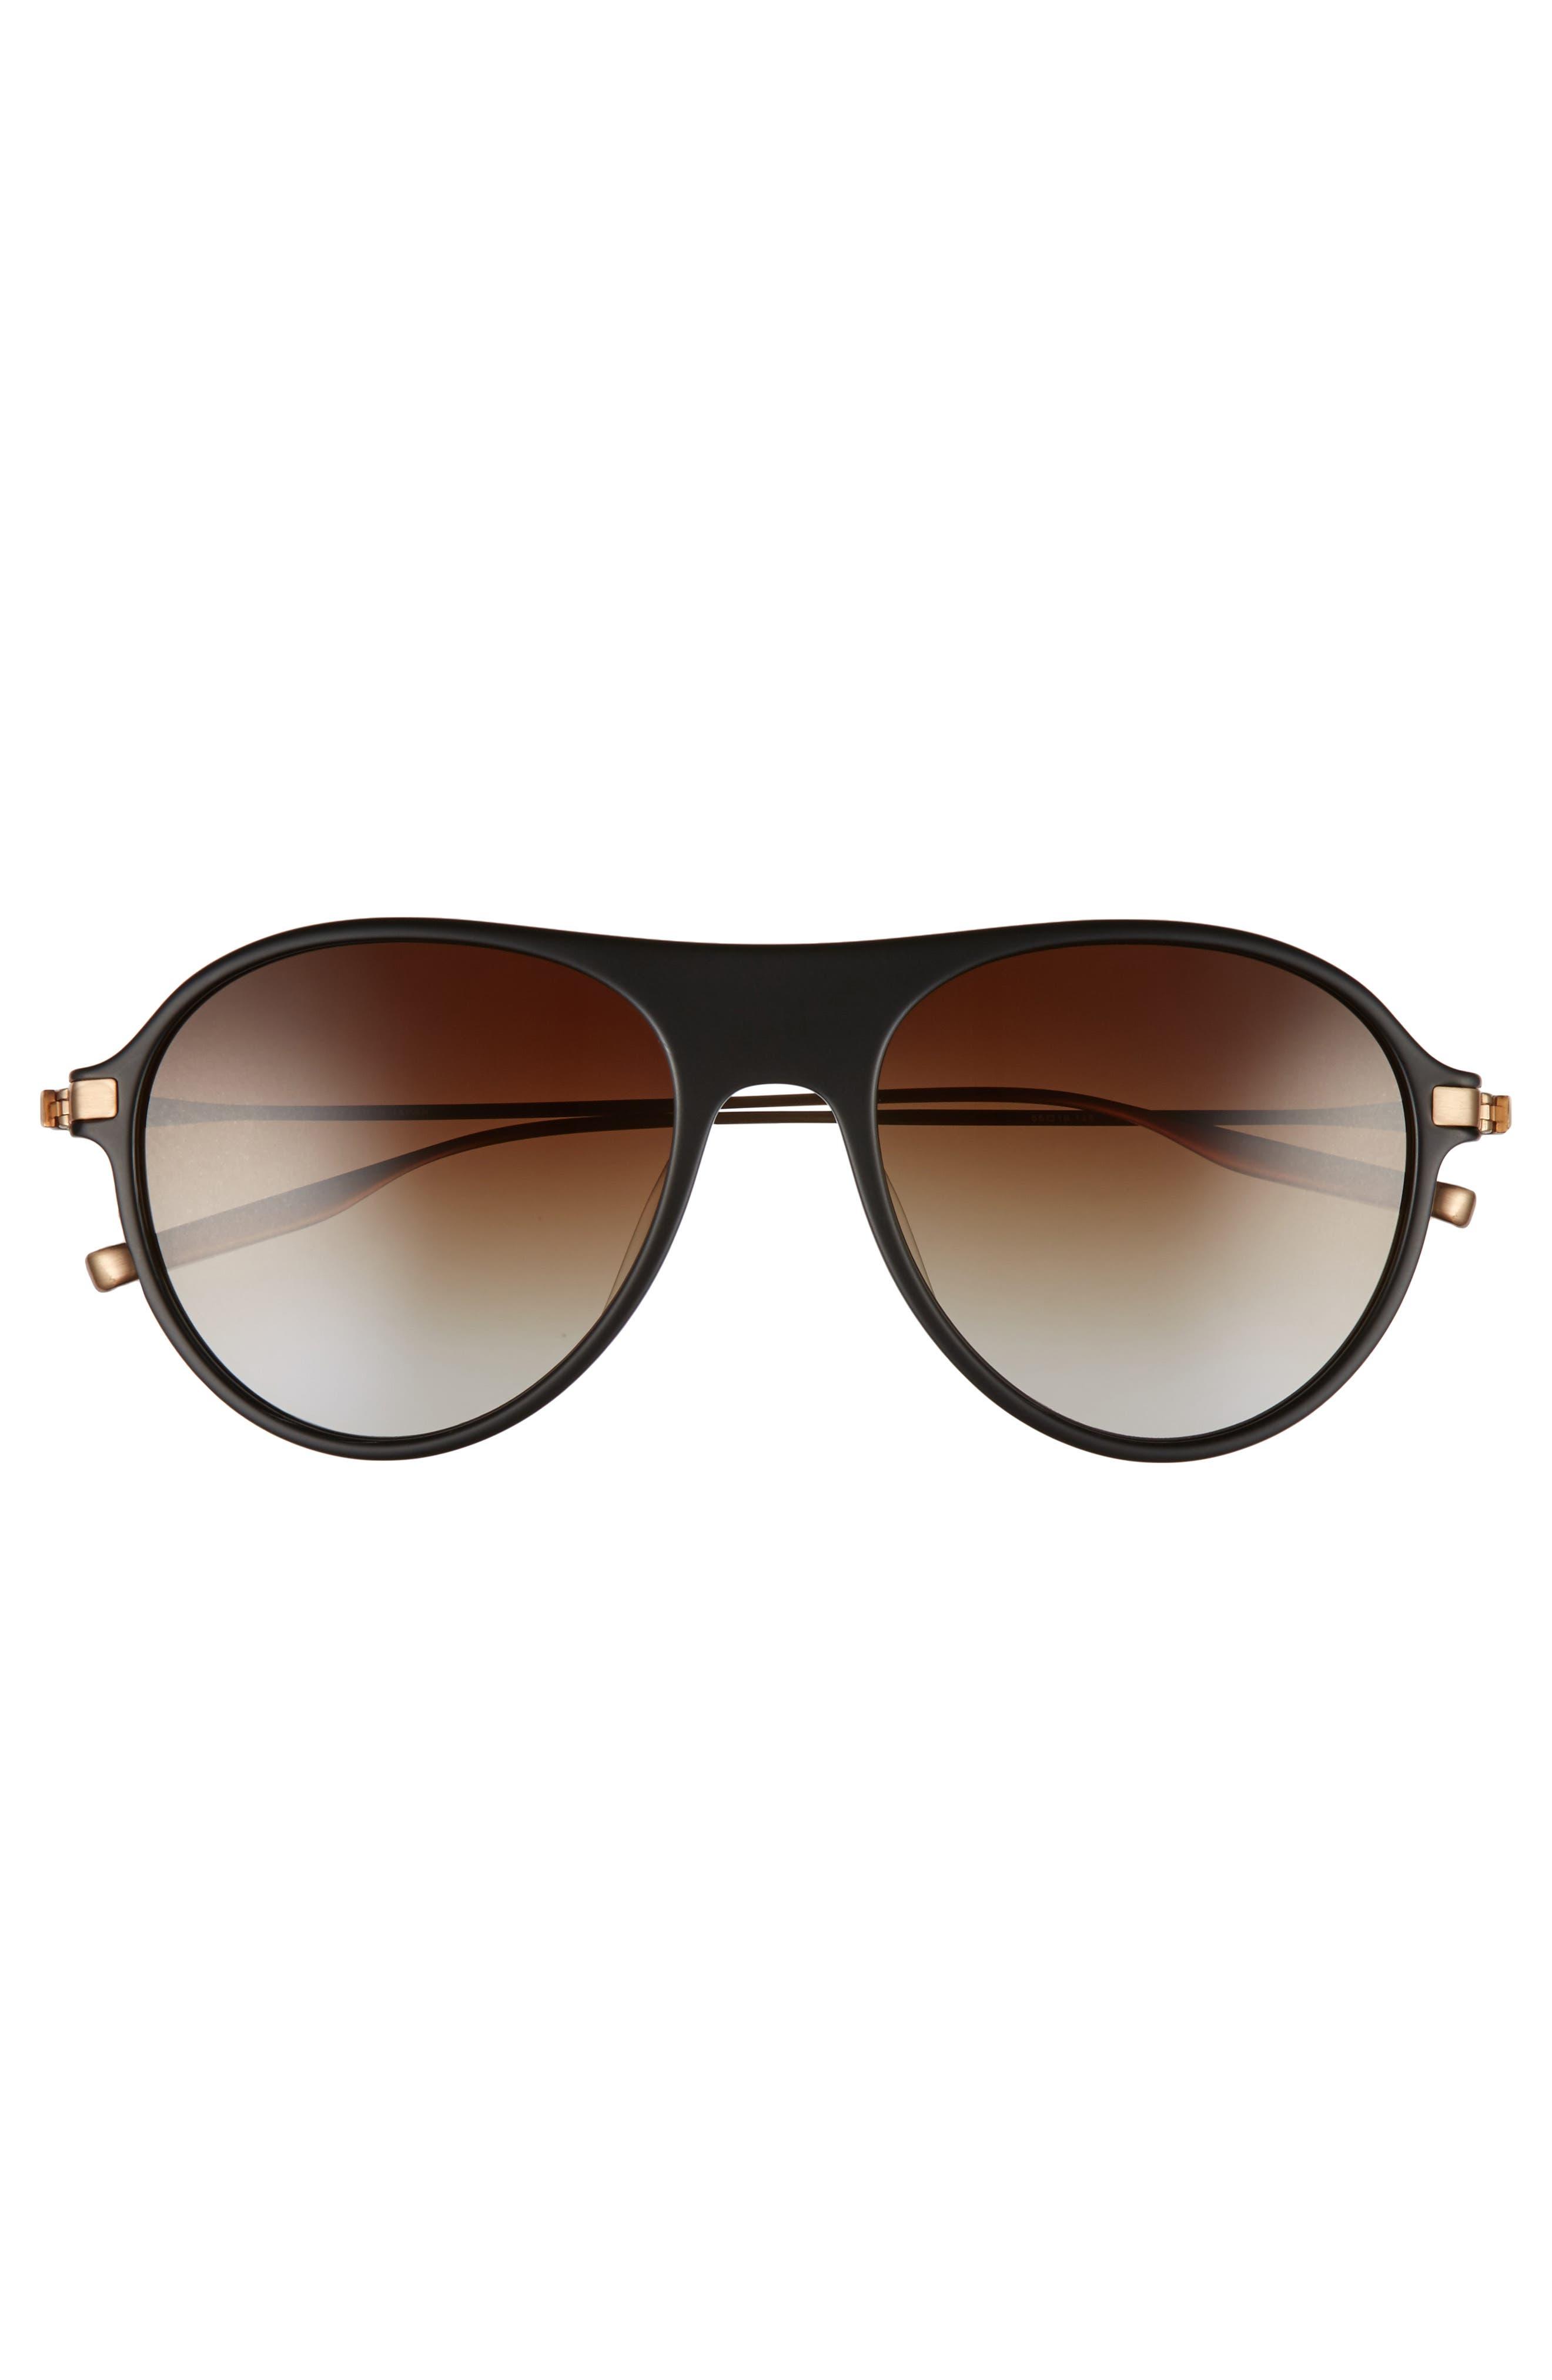 St. Hubbins 55mm Polarized Sunglasses,                             Alternate thumbnail 2, color,                             MATTE BLACK / BRUSHED HONEY